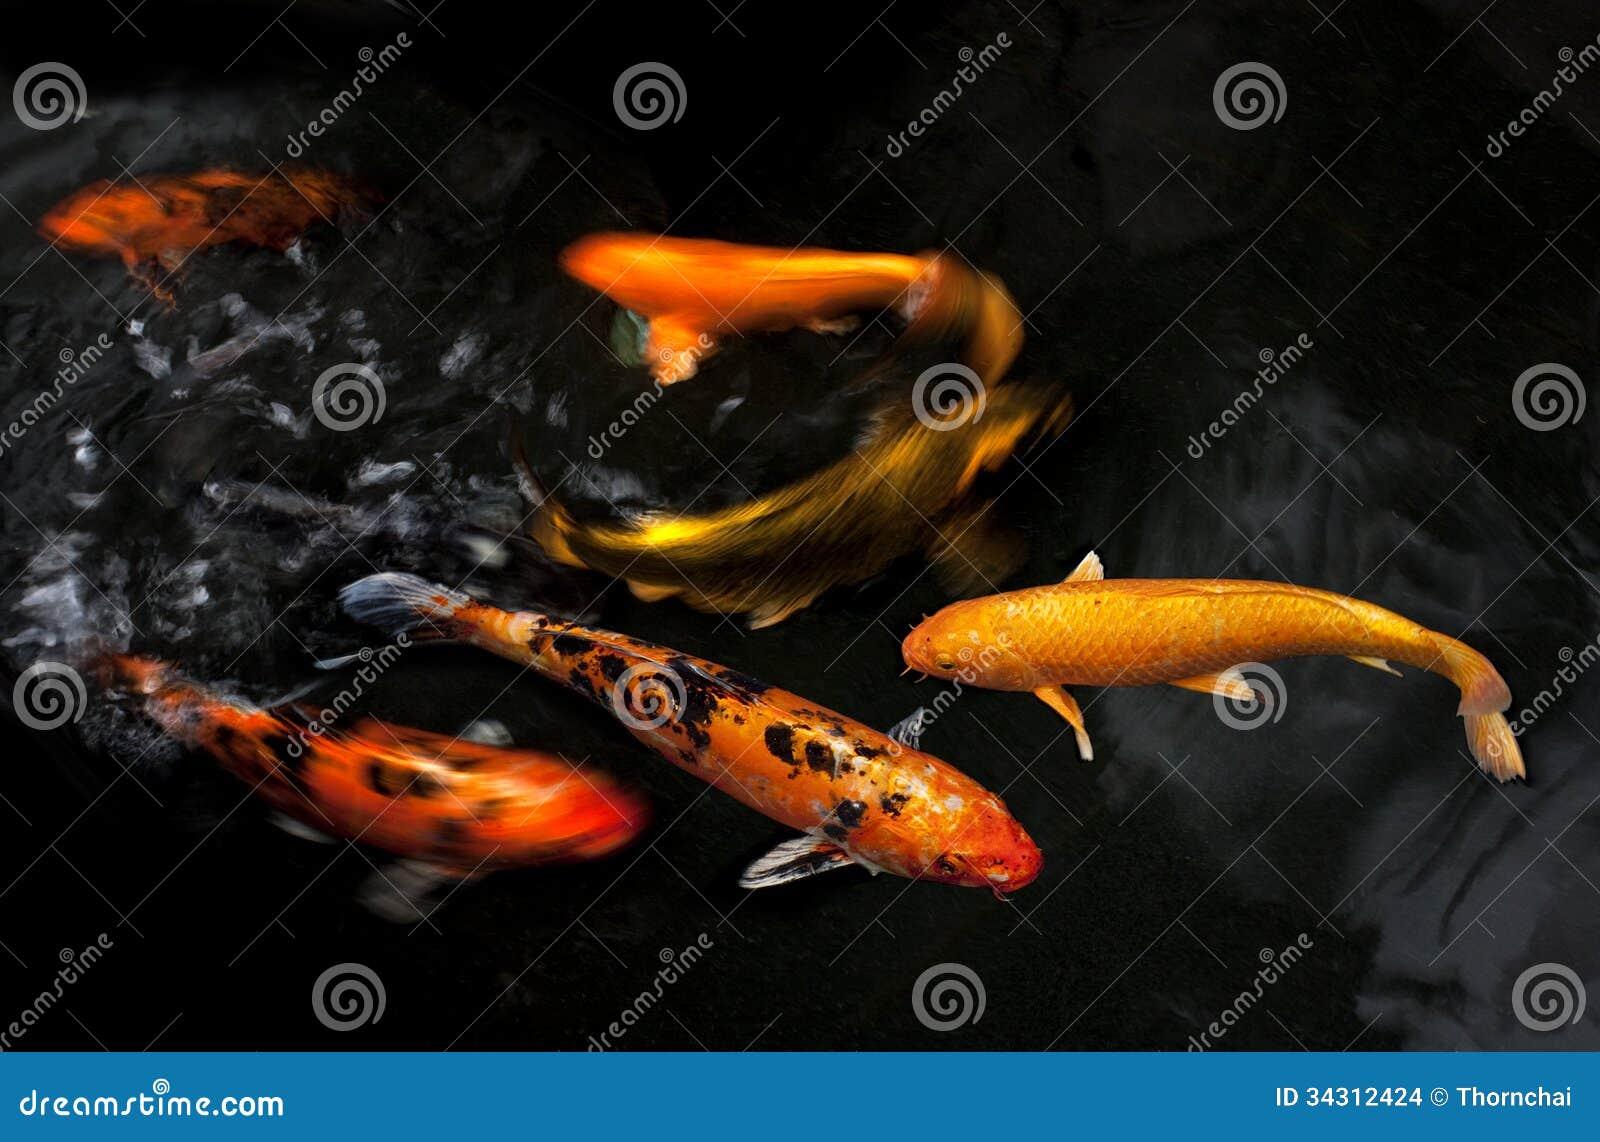 Koi fancy carp stock images image 34312424 for Fancy koi fish